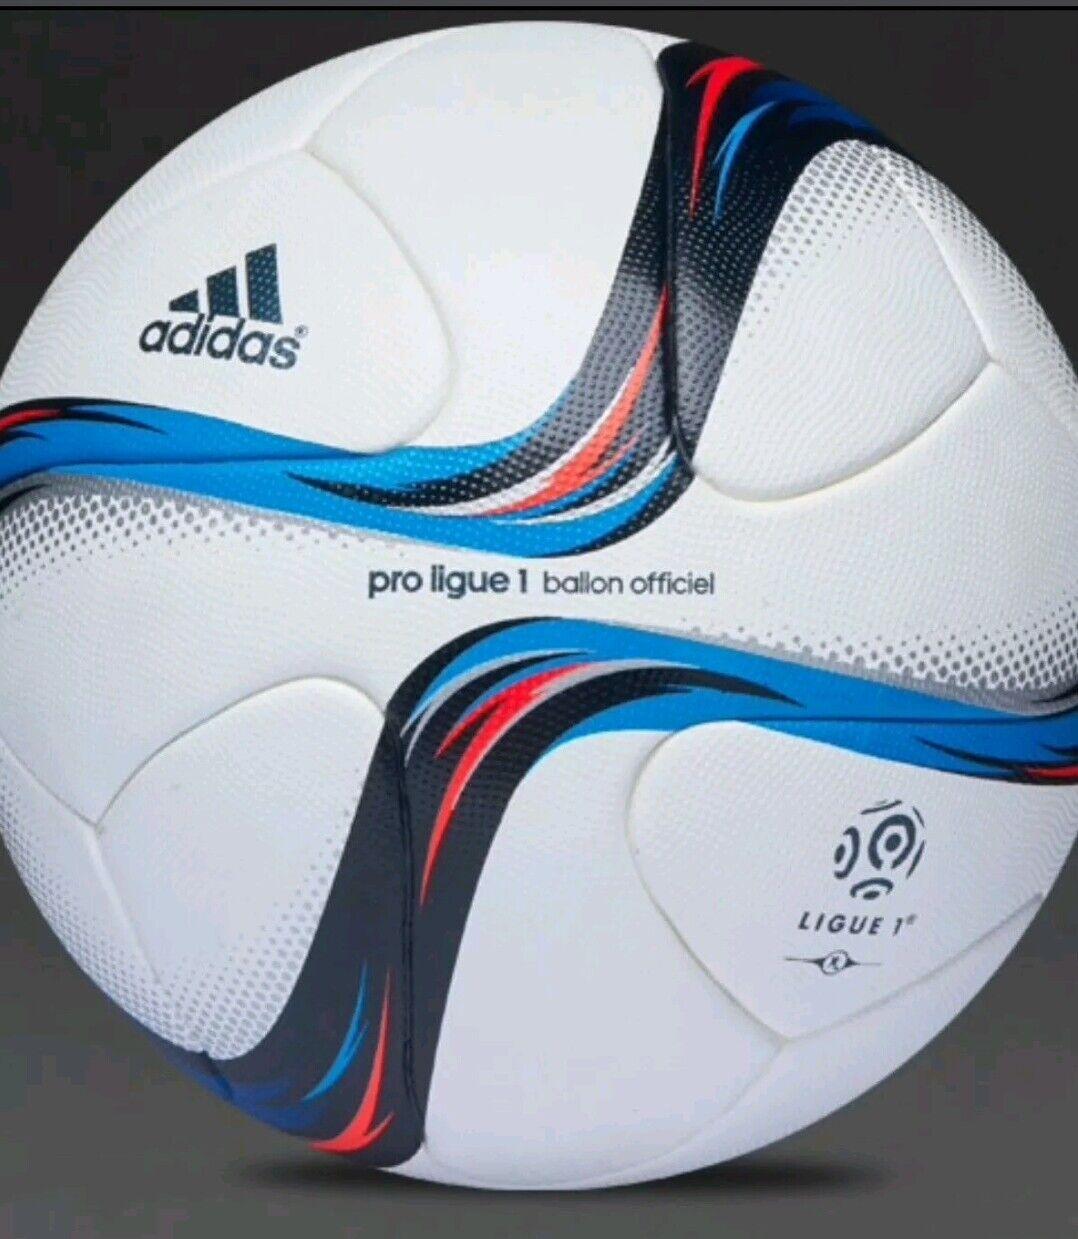 Adidas Match Ball Pro Ligue 1 English French Soccer League Ballon For Sale Online Ebay